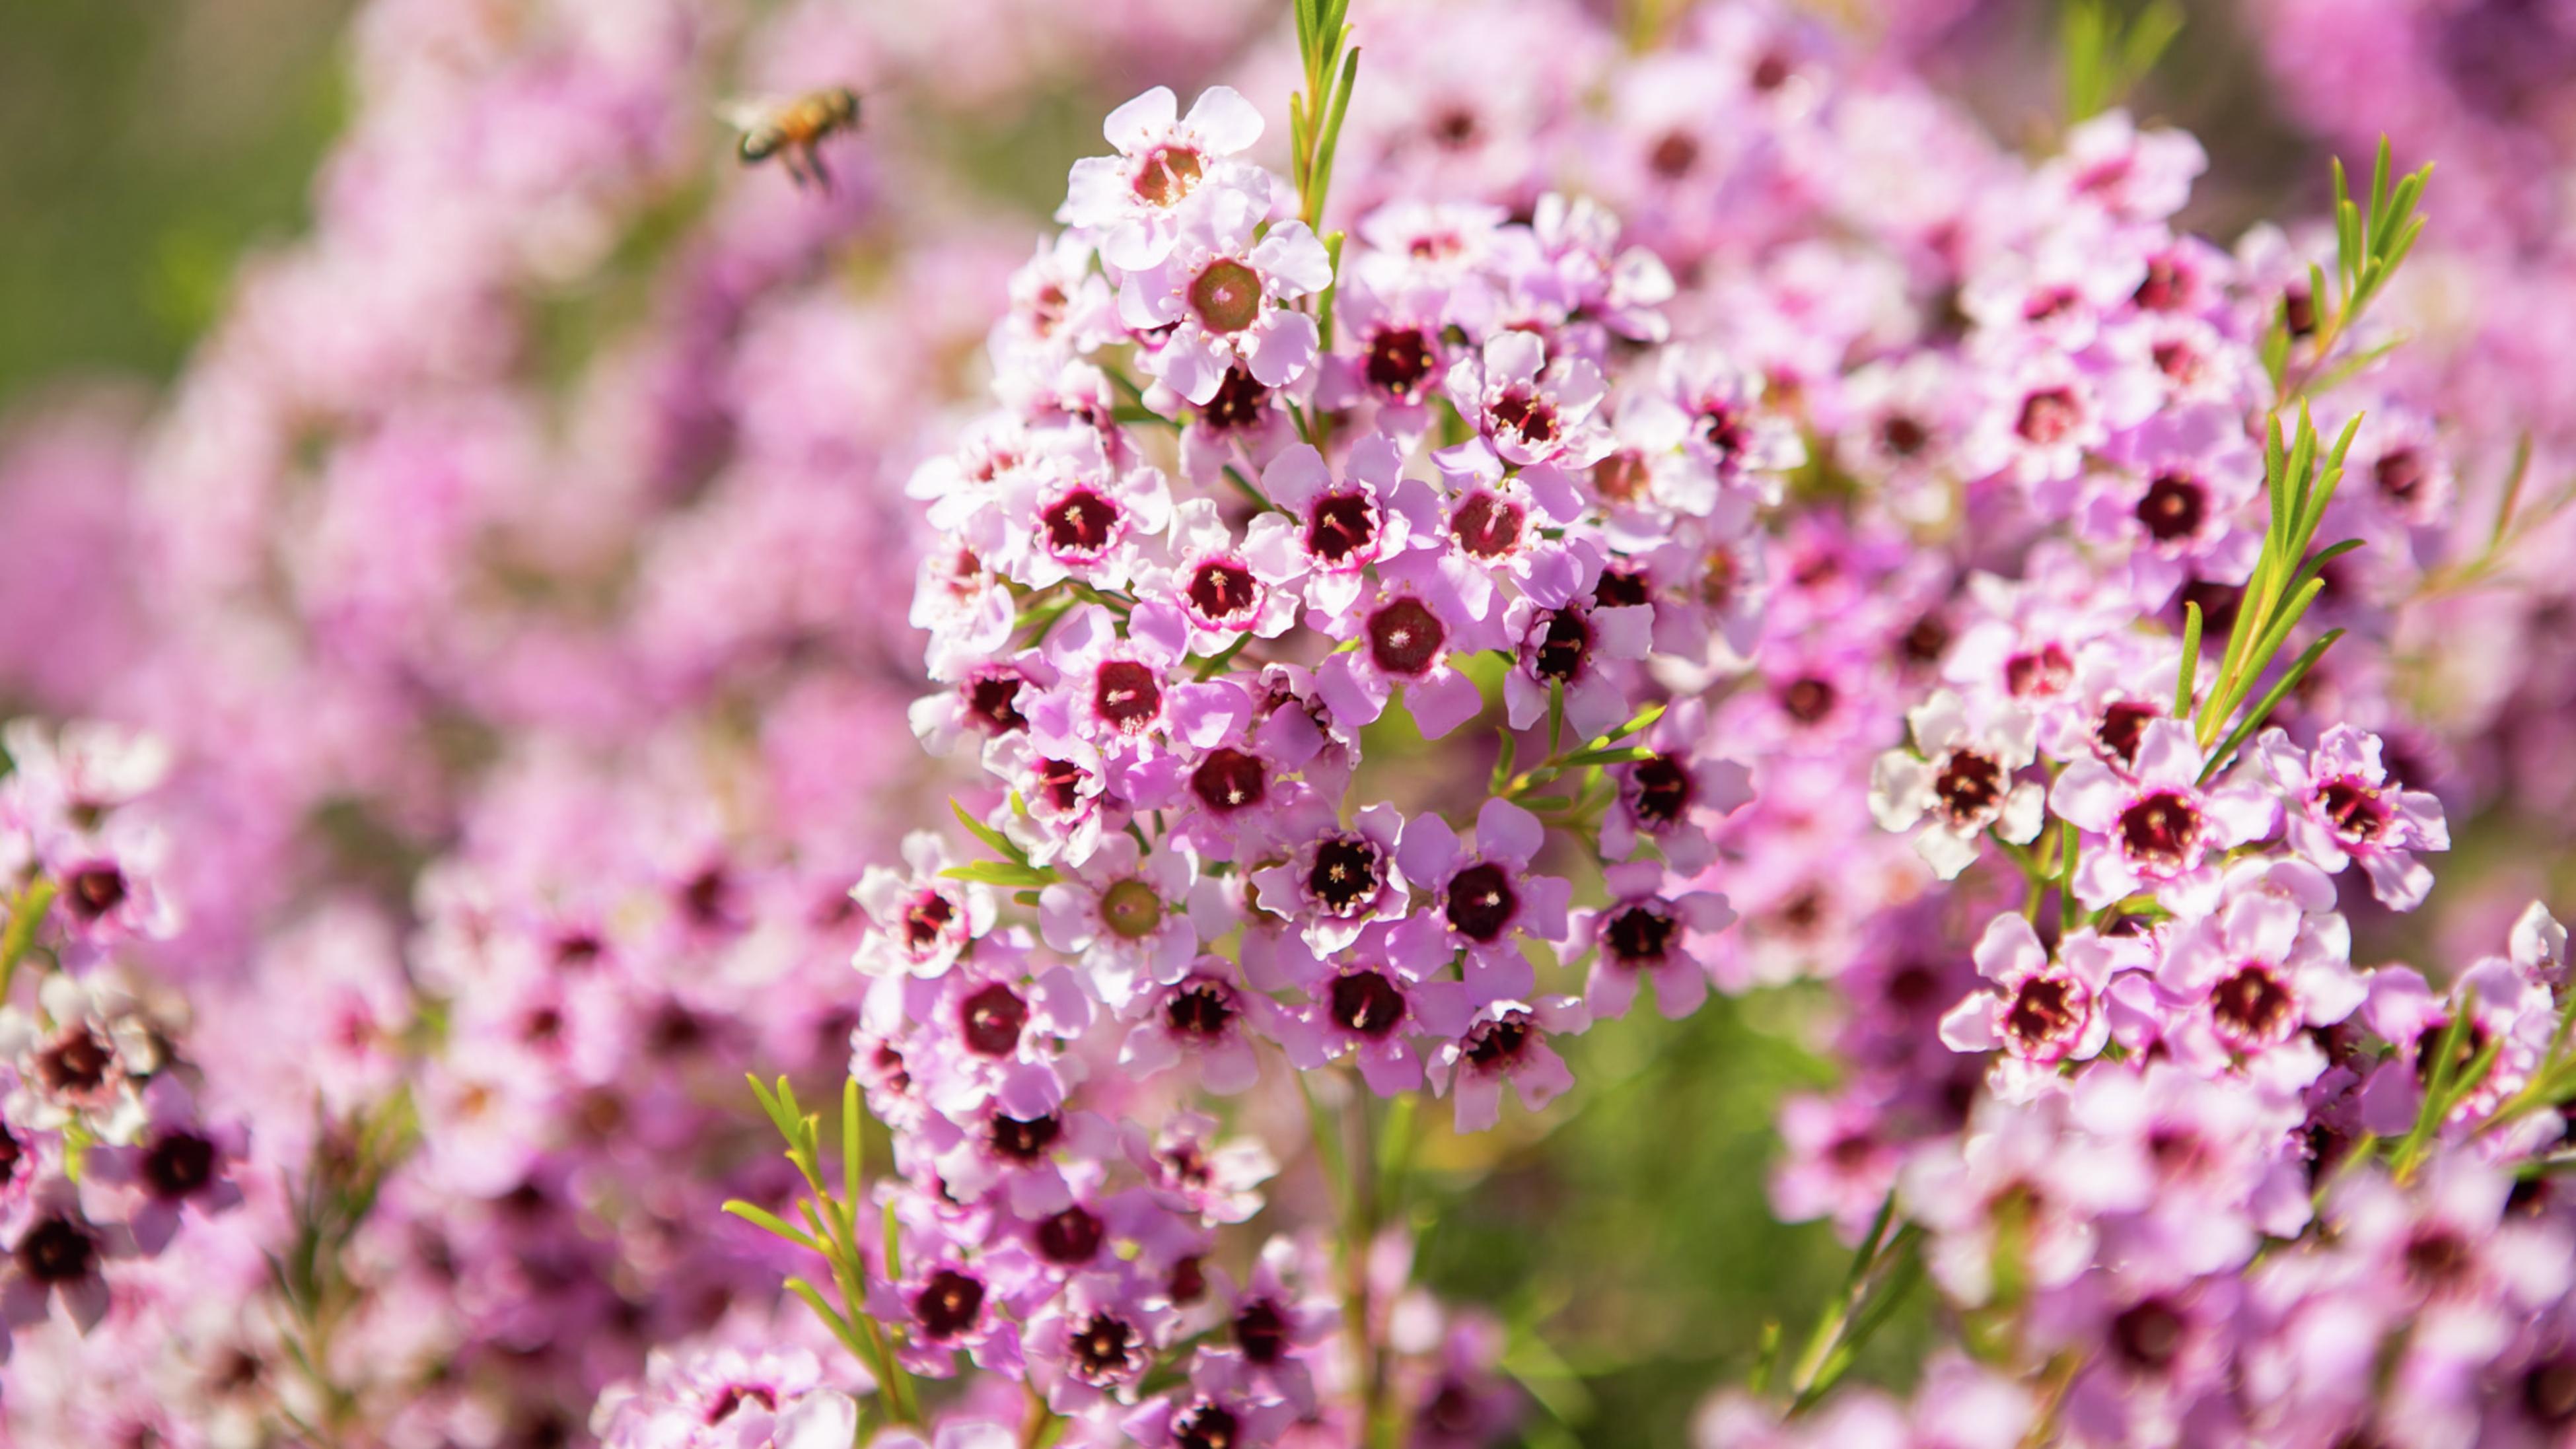 A bee on the purple flowers of a Chamelaucium 'Jambinu Zest ' bush